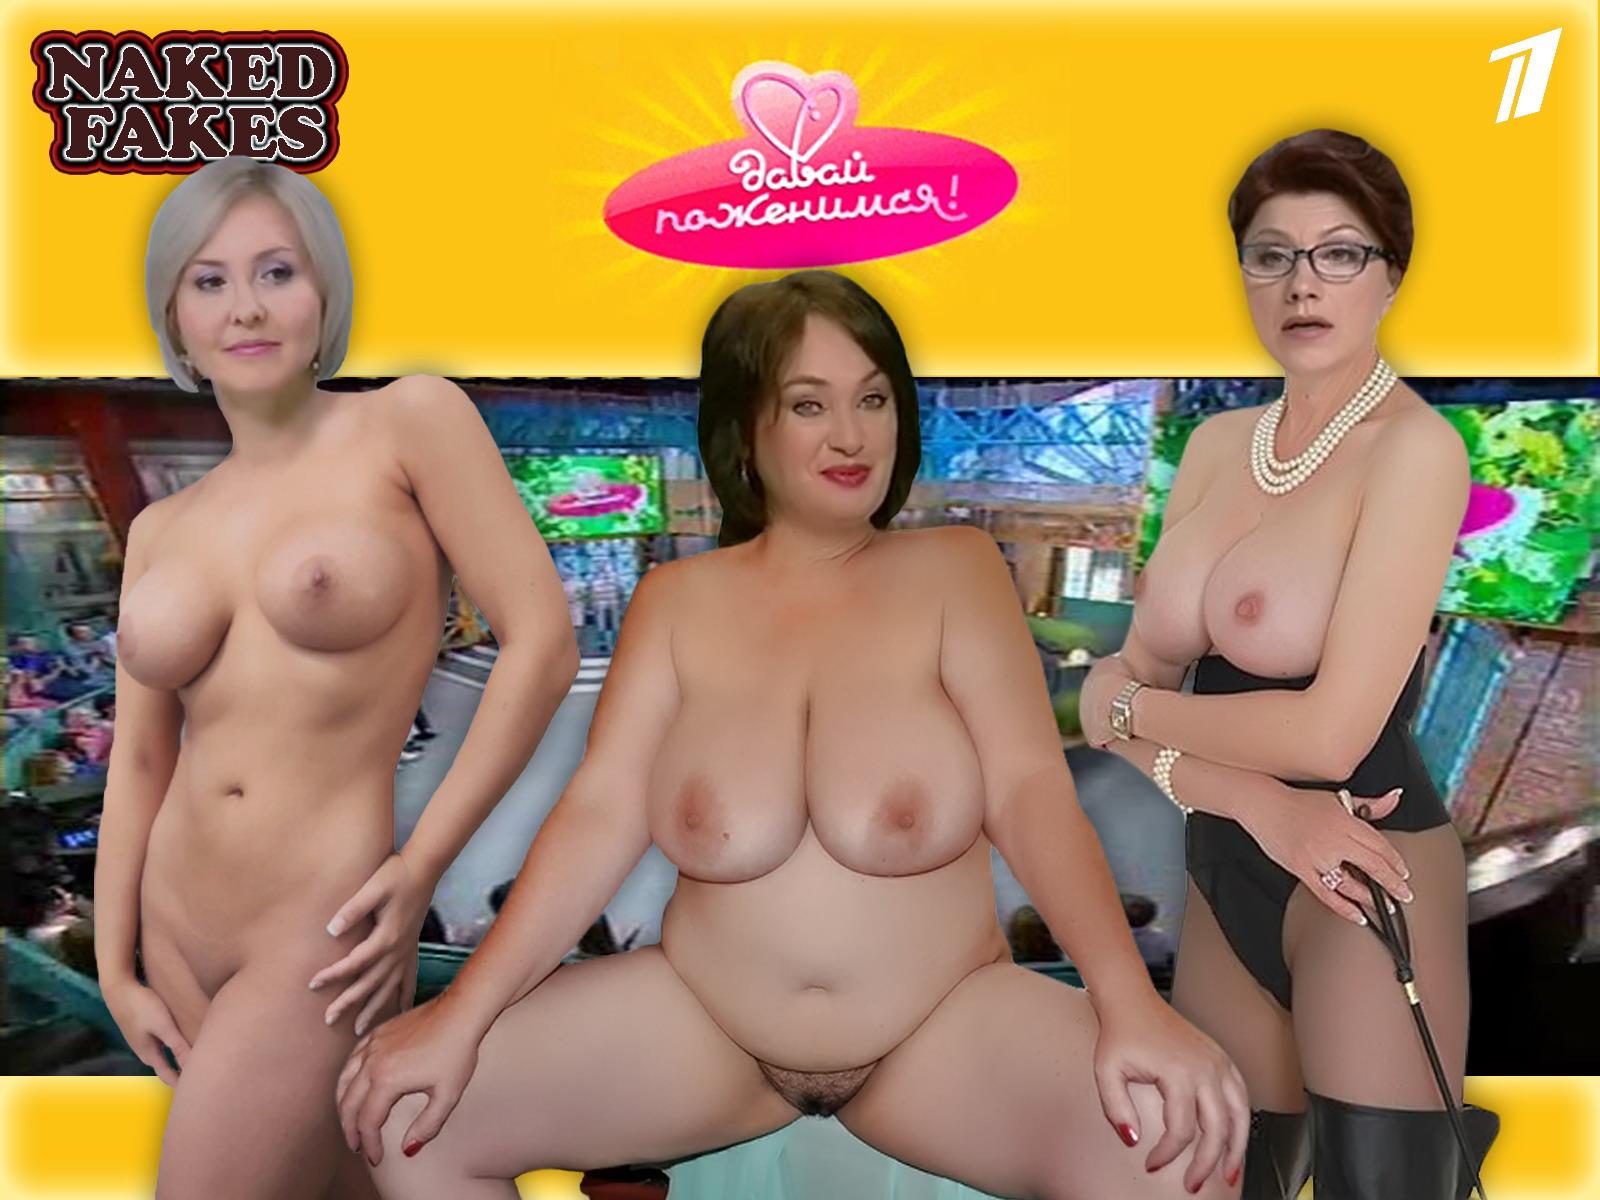 porno-puhlih-porno-roliki-onlayn-izvestnih-rossiyskih-televedushih-russkoe-zrelie-sosedka